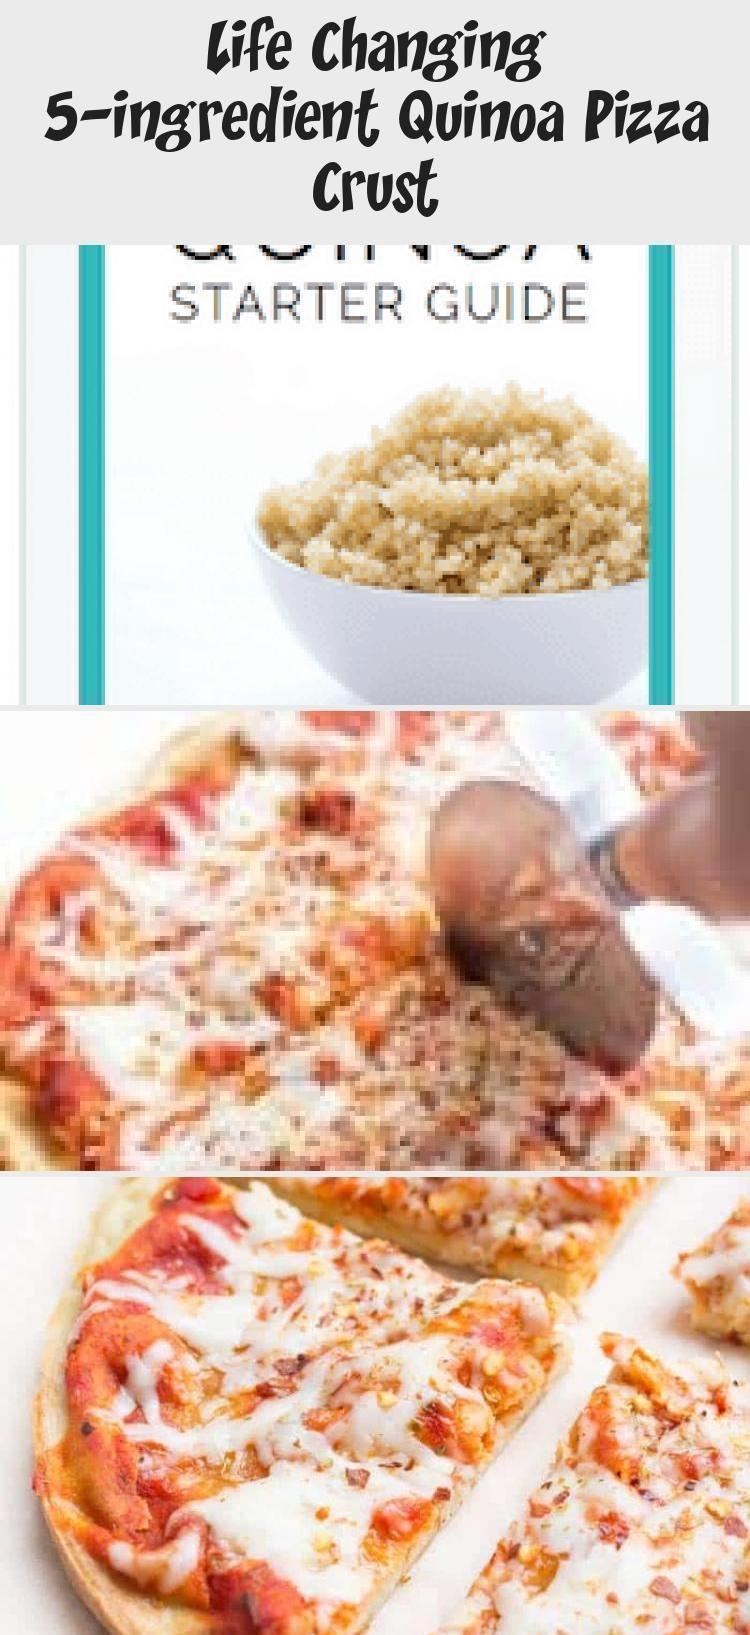 Life Changing 5-Ingredient Quinoa Pizza Crust - This quinoa pizza crust stands u... #zucchinipizzacrust Life Changing 5-Ingredient Quinoa Pizza Crust - This quinoa pizza crust stands u..., #5Ingredient #Changing #Crust #life #Pizza #Quinoa #stands #zucchinipizzacrust Life Changing 5-Ingredient Quinoa Pizza Crust - This quinoa pizza crust stands u... #zucchinipizzacrust Life Changing 5-Ingredient Quinoa Pizza Crust - This quinoa pizza crust stands u..., #5Ingredient #Changing #Crust #life #Pizza